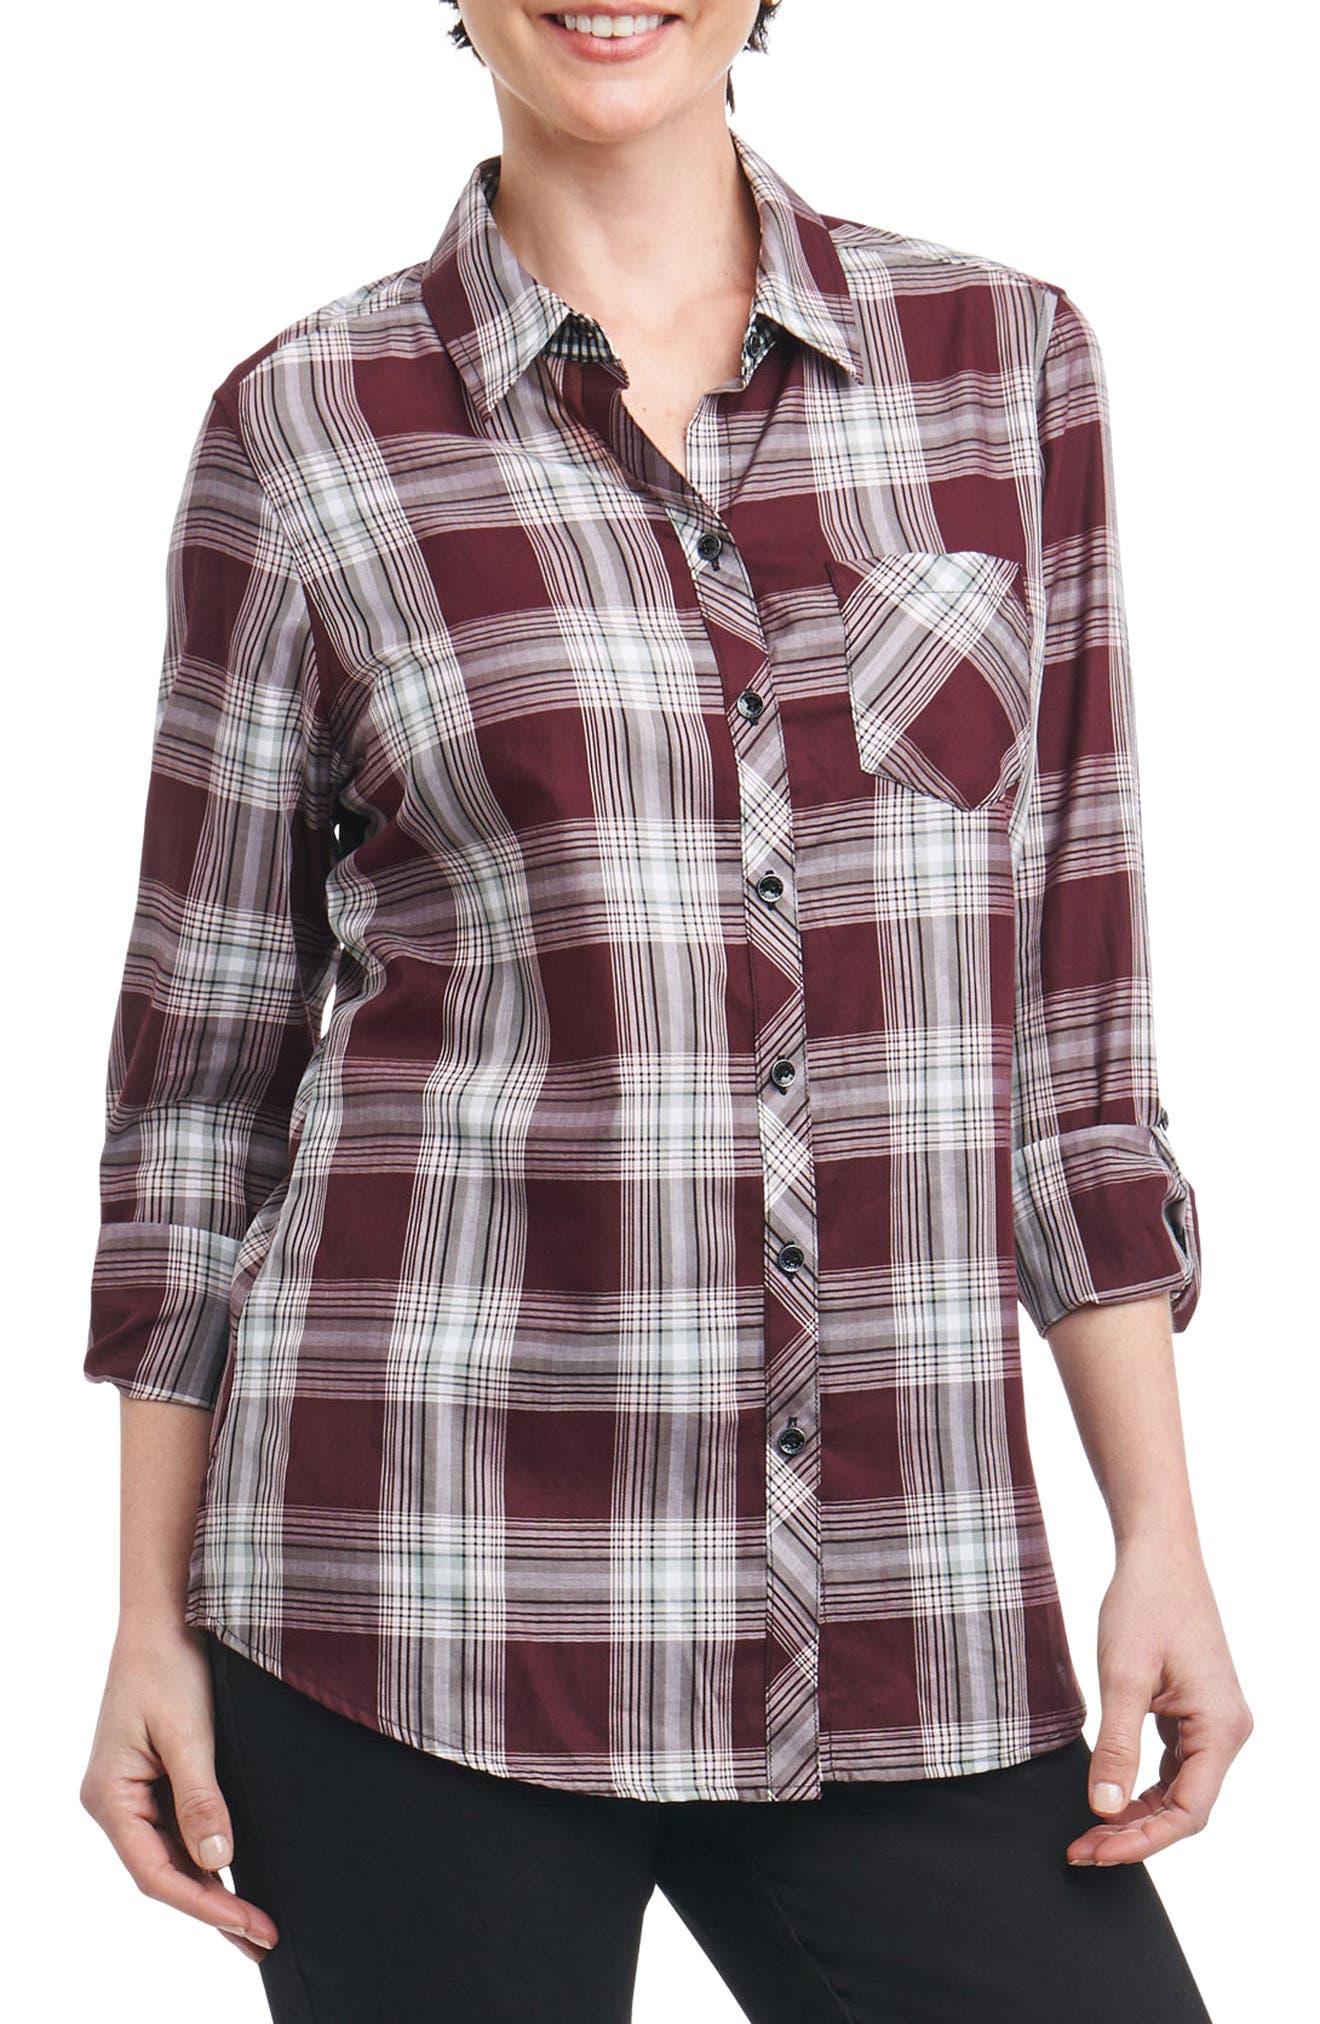 Alternate Image 1 Selected - Foxcroft Addison Plaid Shirt (Regular & Petite)